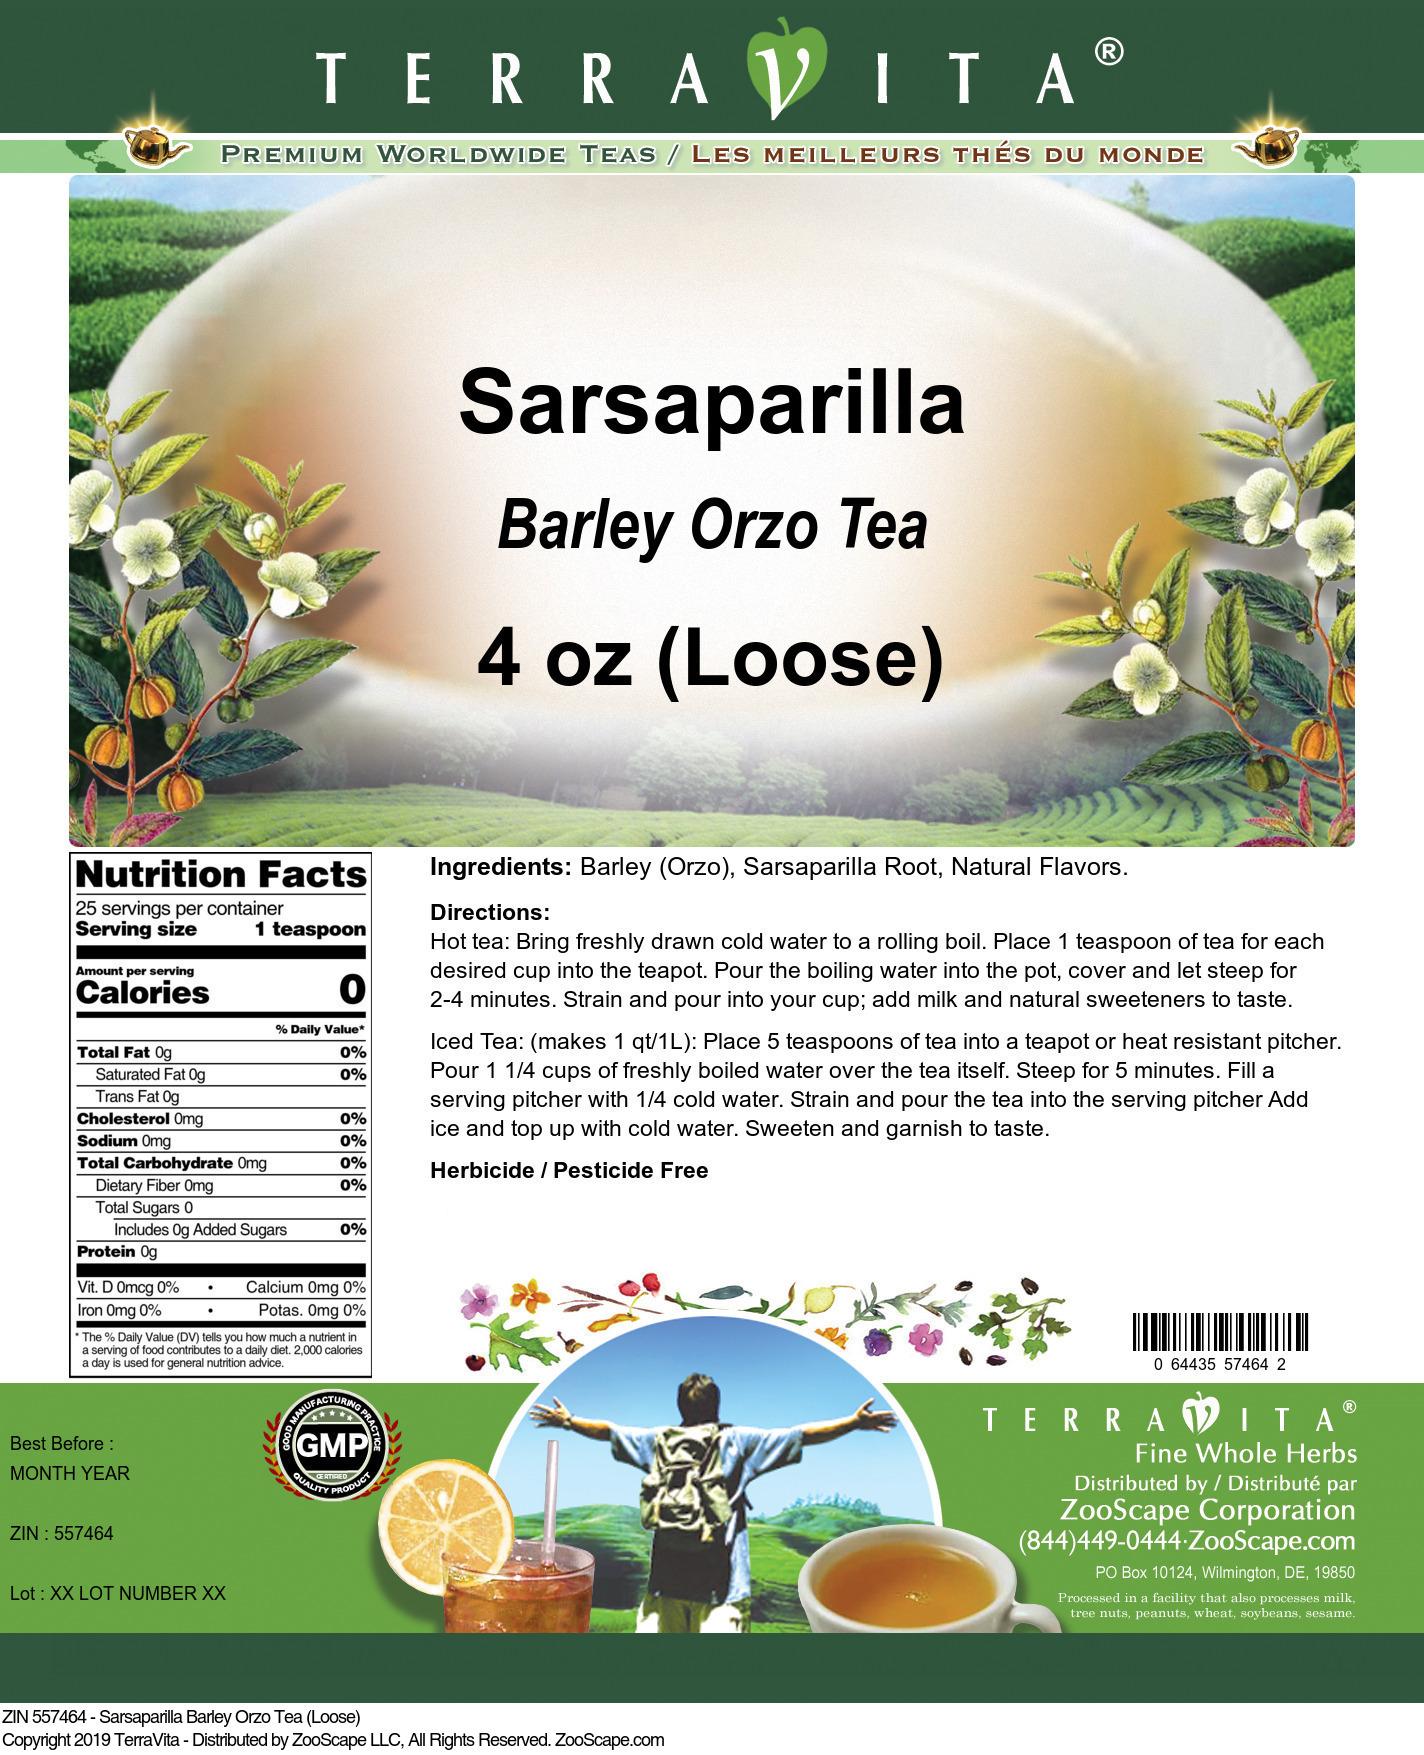 Sarsaparilla Barley Orzo Tea (Loose)